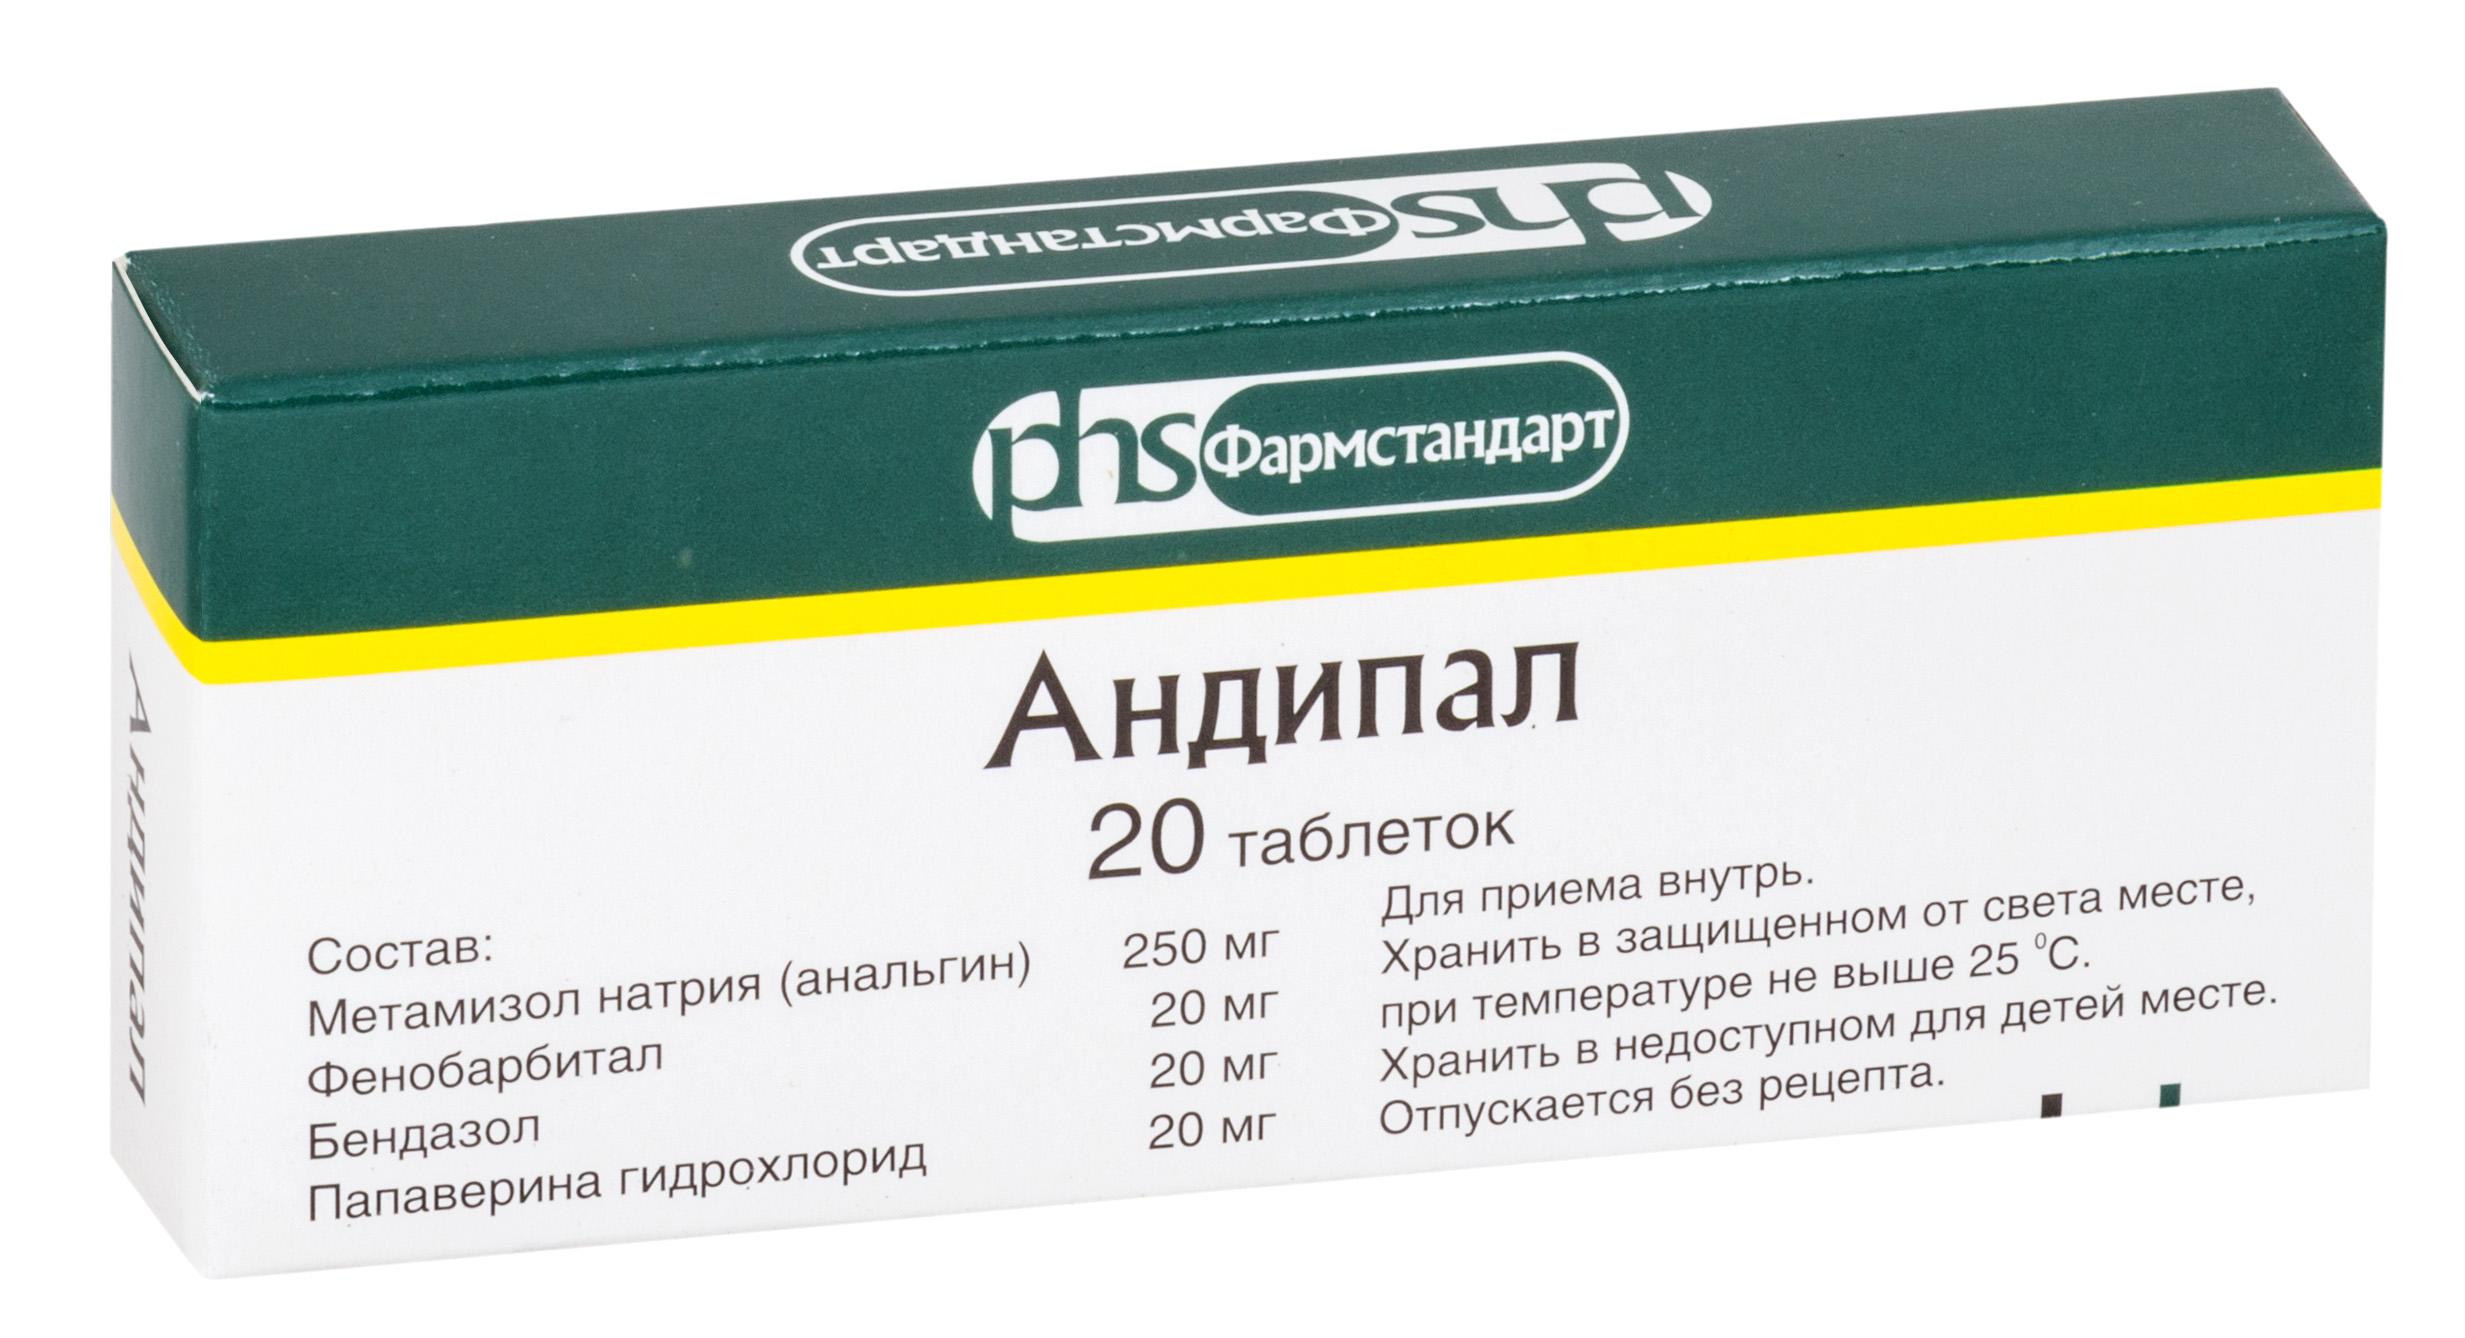 Андипал таблетки №20 Фармстандарт